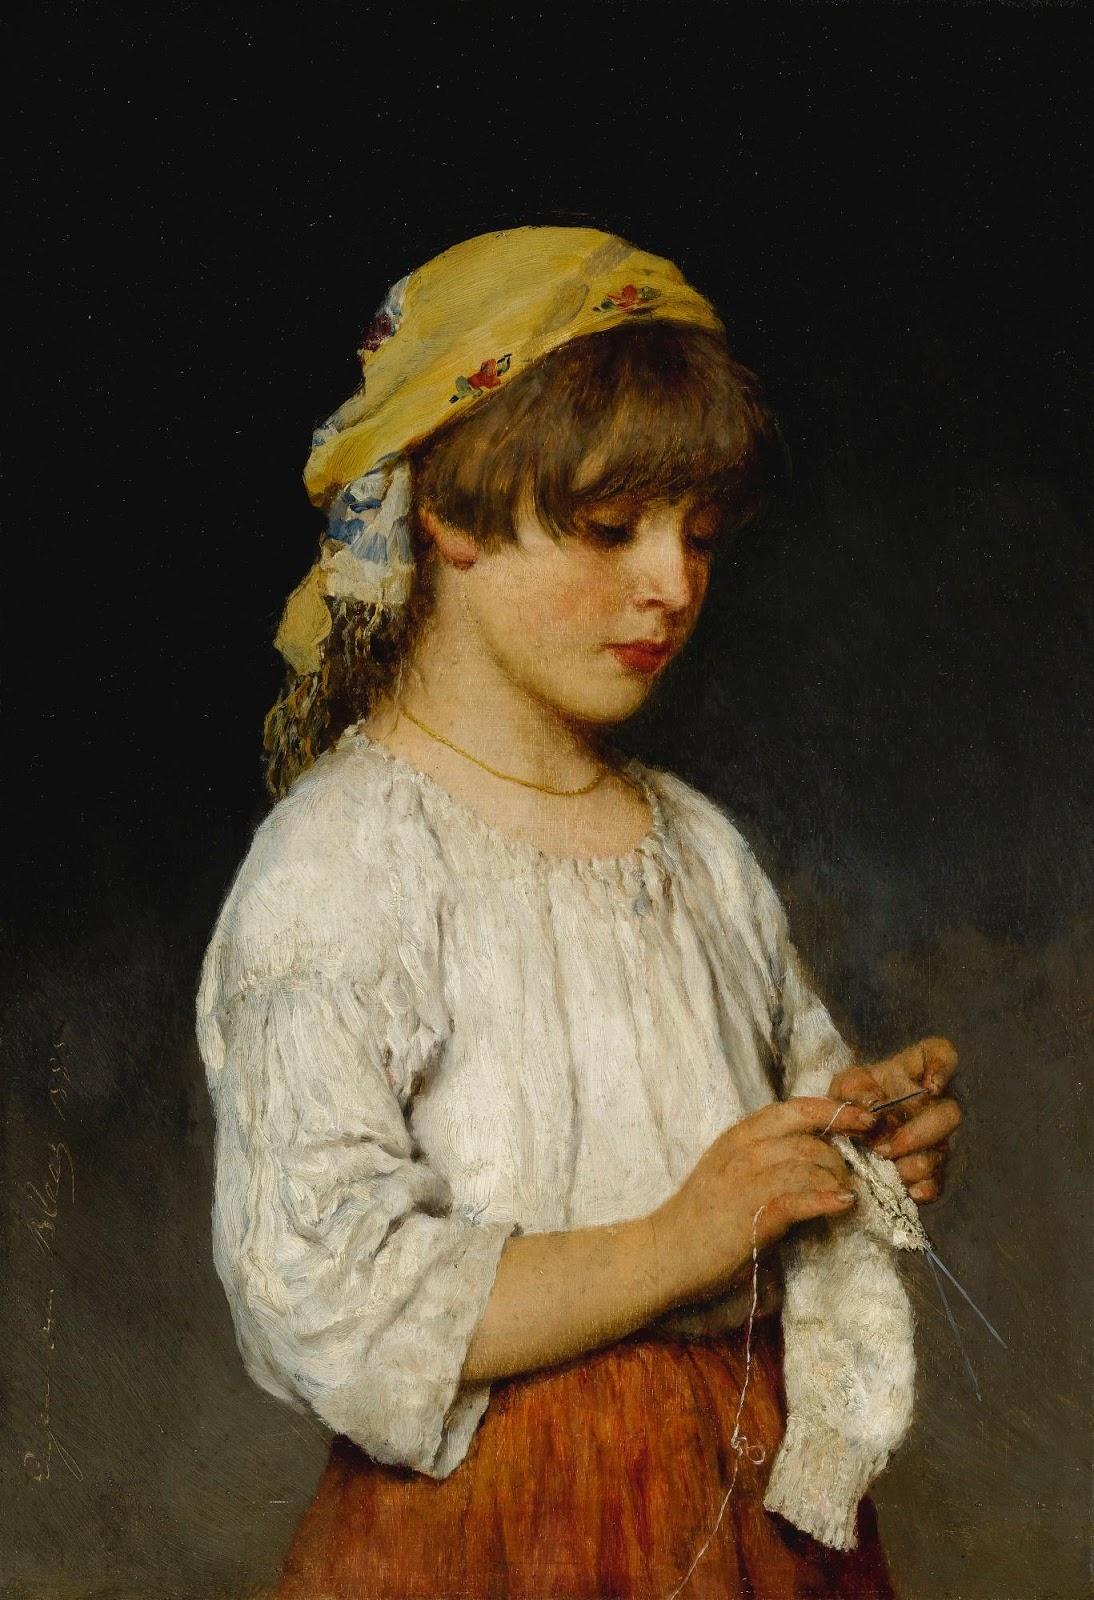 Eugene de  laas Knitting Girl with Headscarf